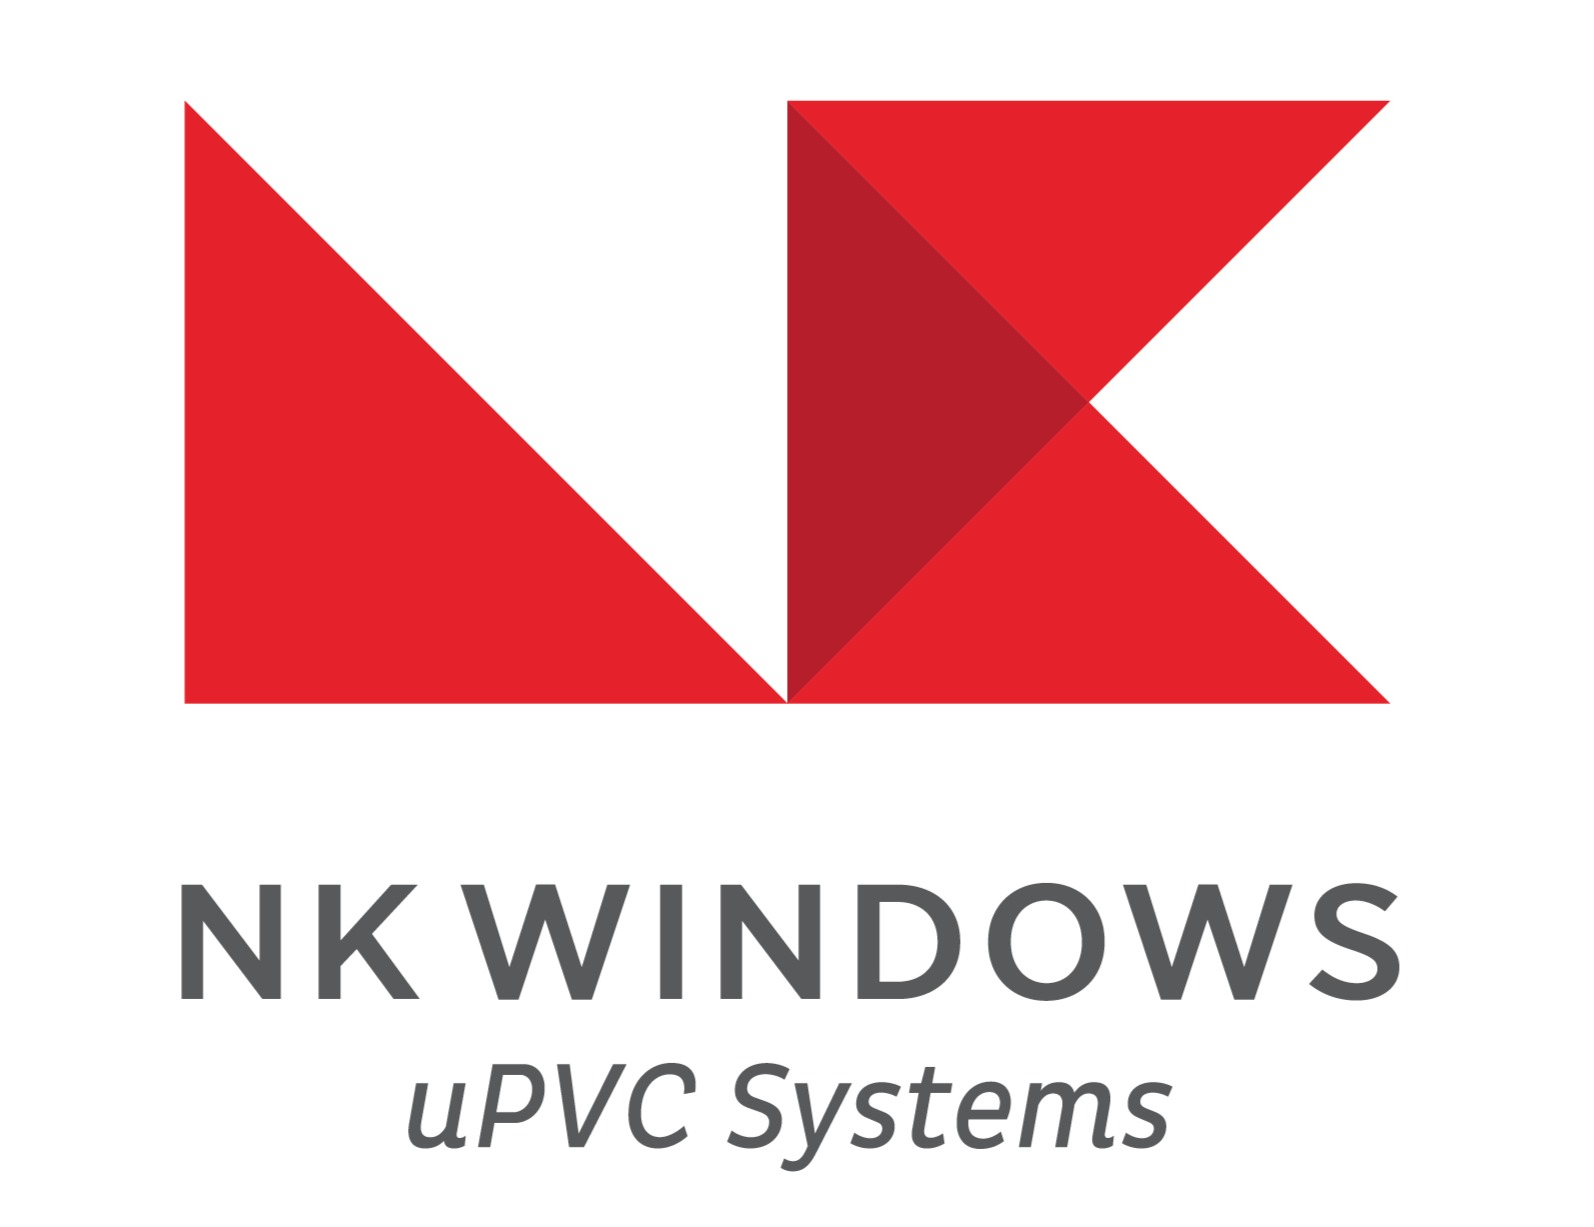 N K Window Solutions Ltd